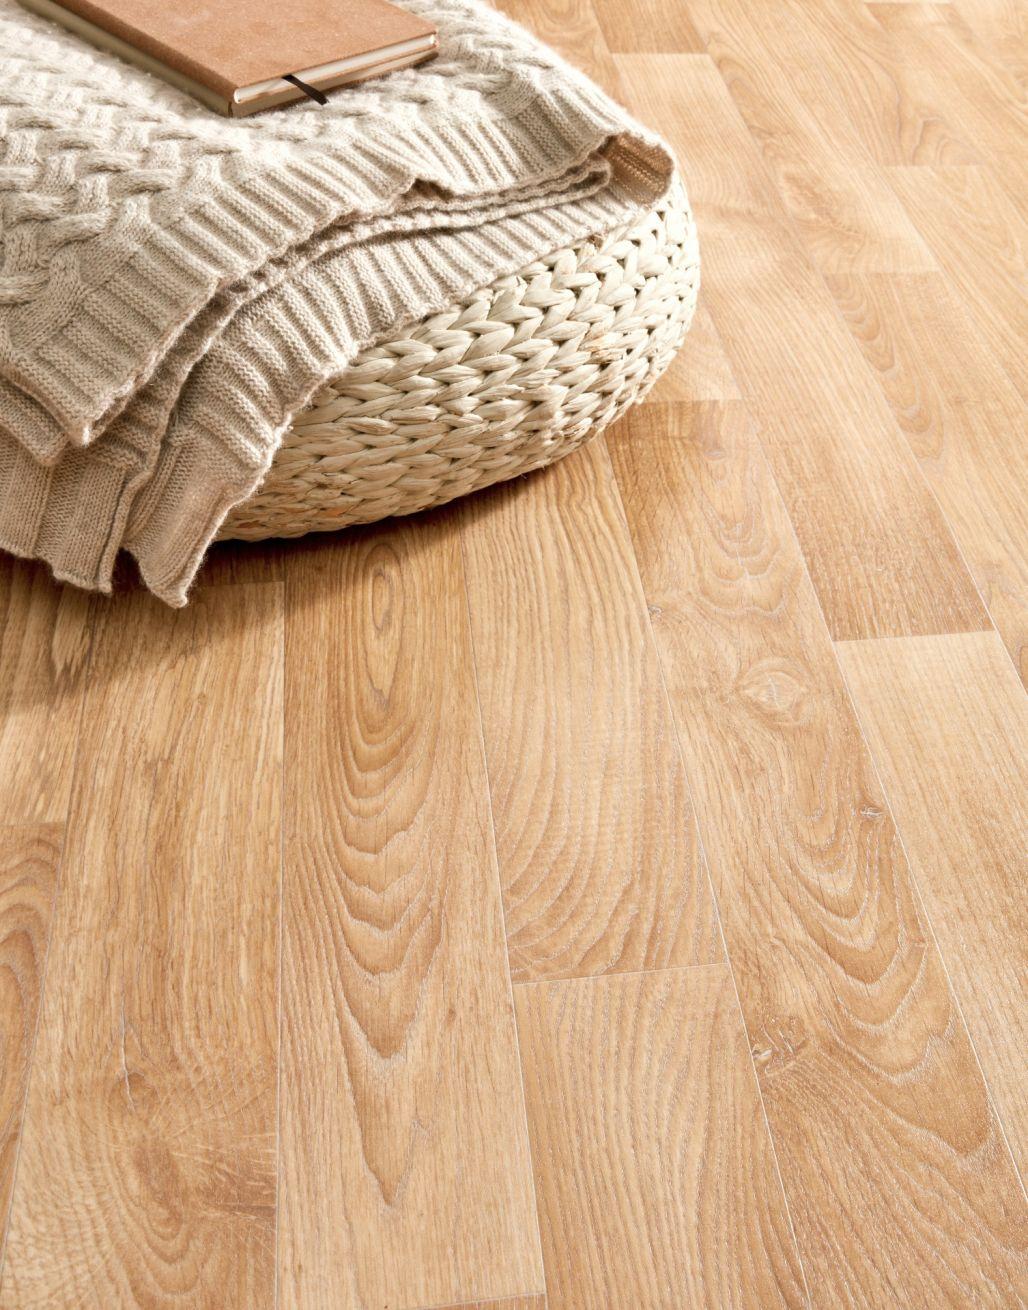 Wiltshire French Oak Flooring, Gosford Light Grey Oak Effect Laminate Flooring